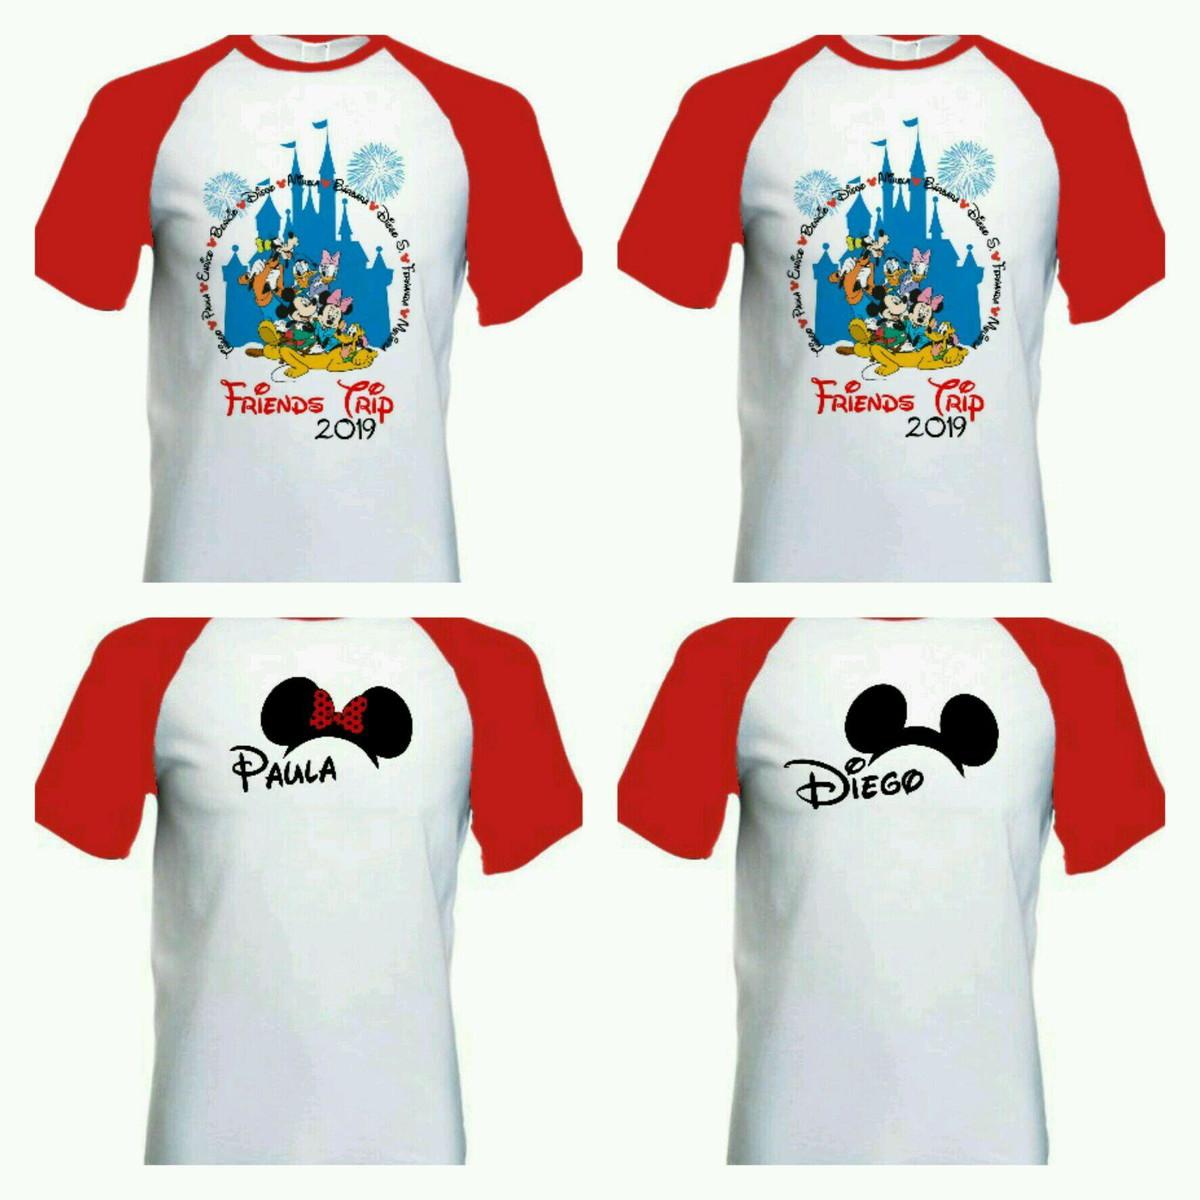 fc61910dbf kit camiseta para viagem Disney raglan no Elo7